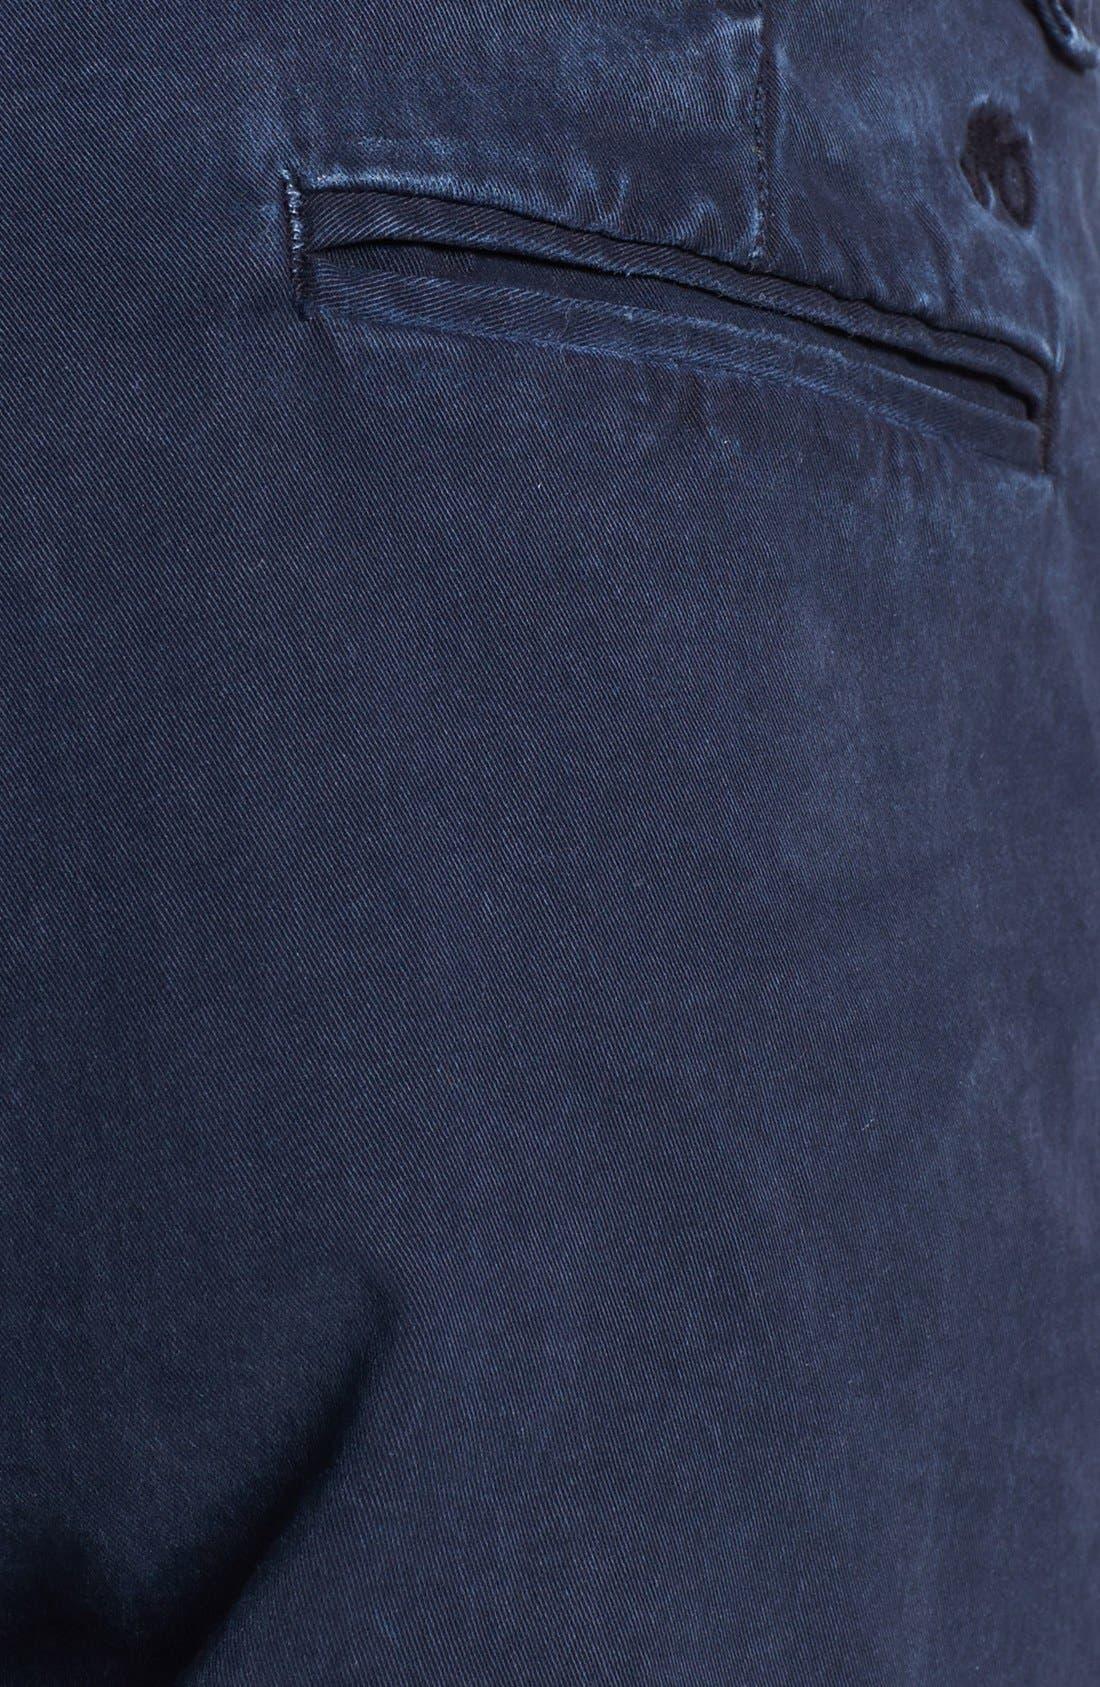 Alternate Image 3  - Moods of Norway 'Pedar' Slim Straight Stretch Pants